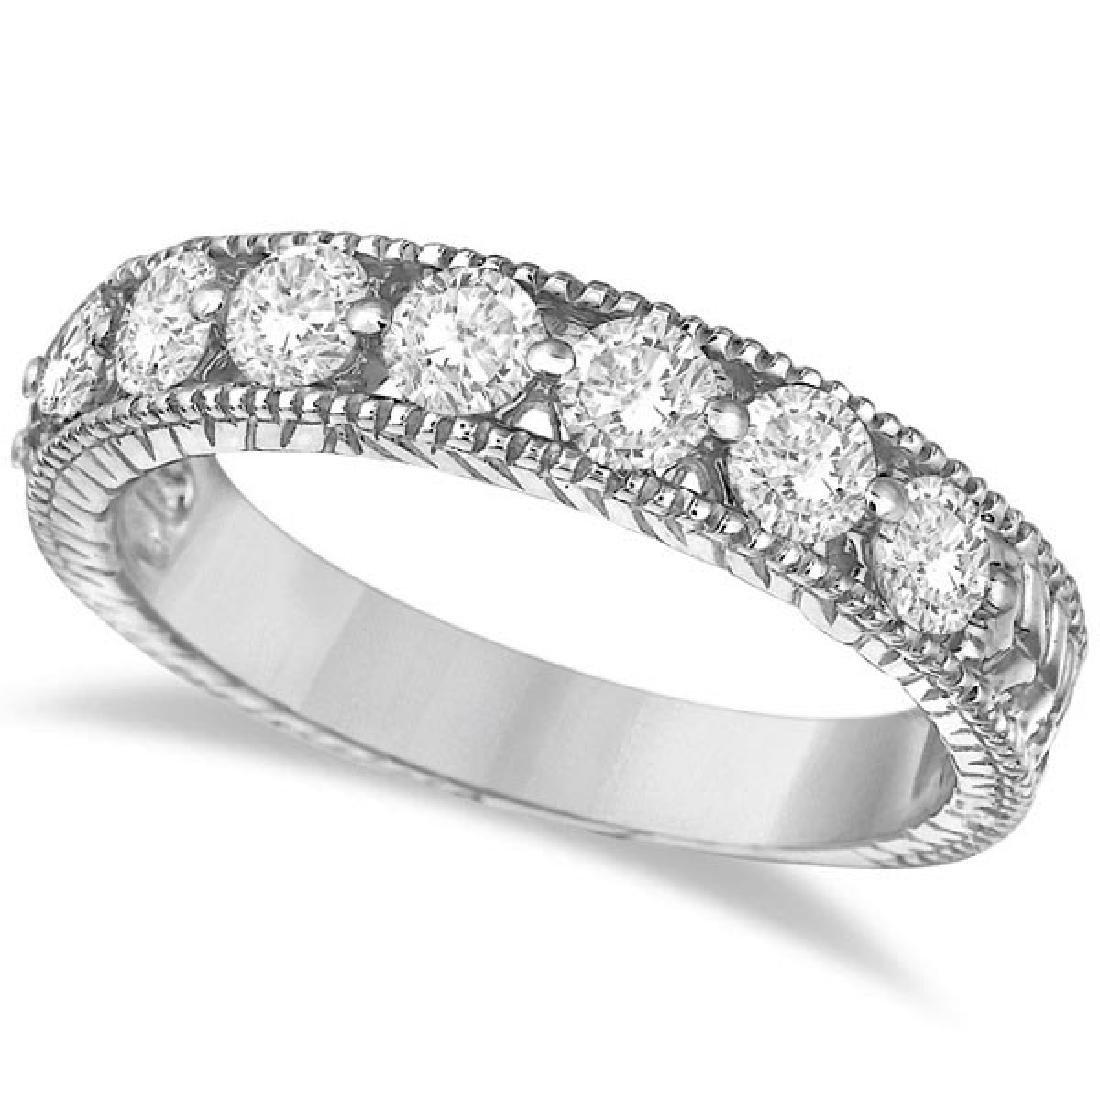 Antique Scrollwork Diamond Wedding Ring Band 14k White